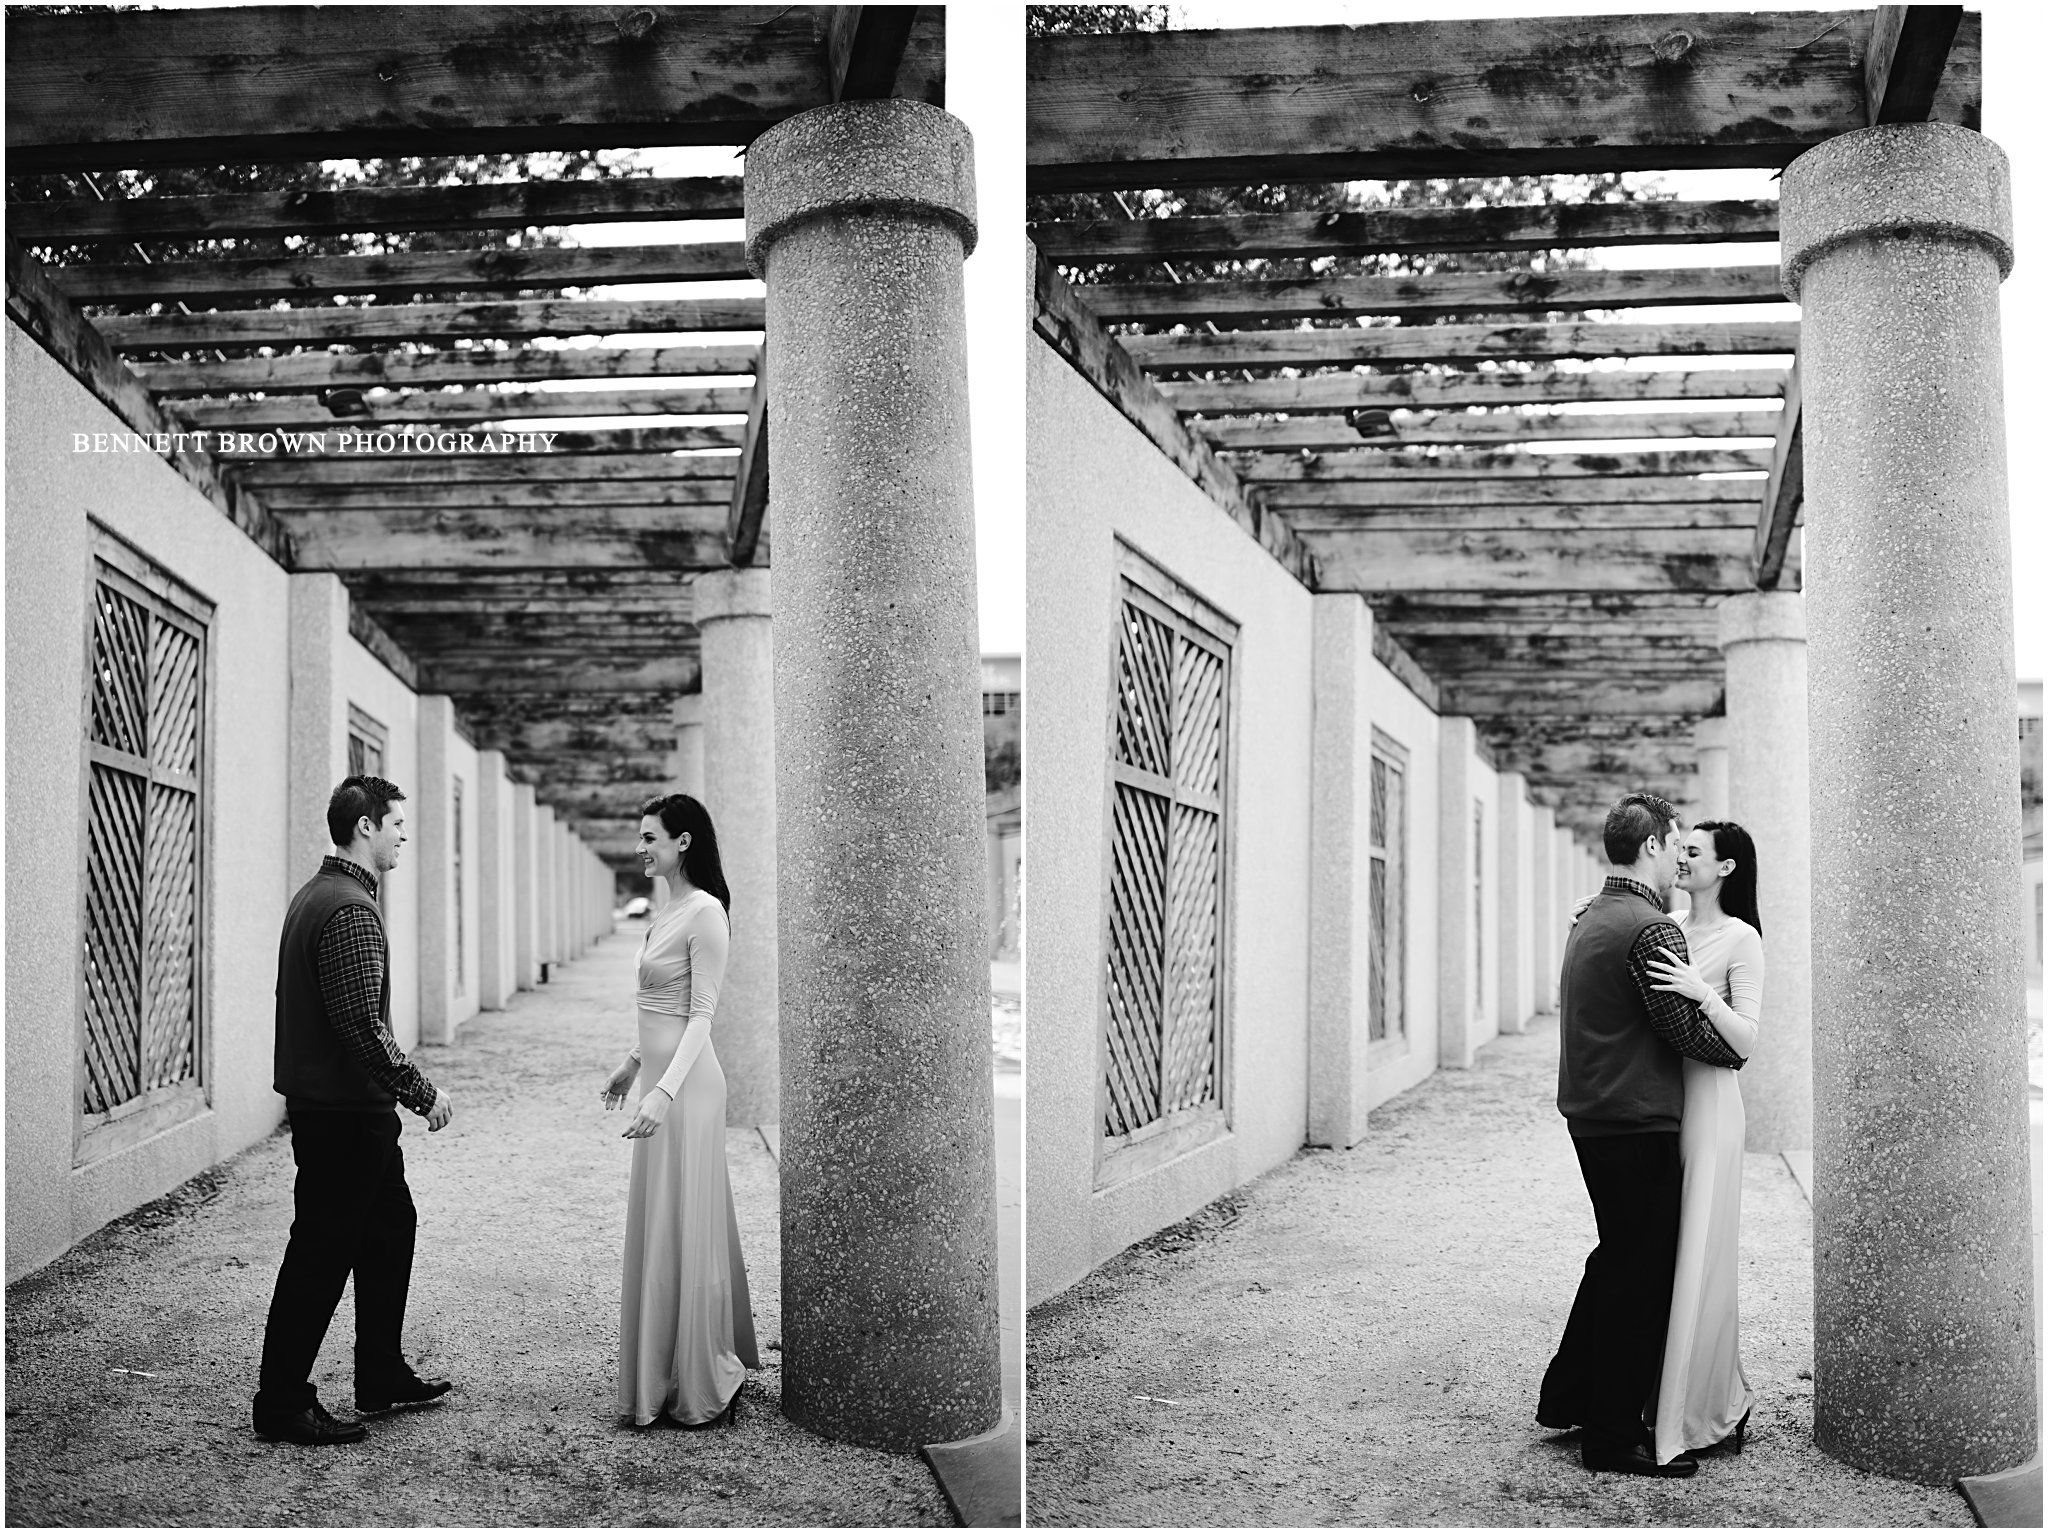 Black and White Photo Bennett Brown Photography Detail shoot Wedding photographer Houston Texas Engagement